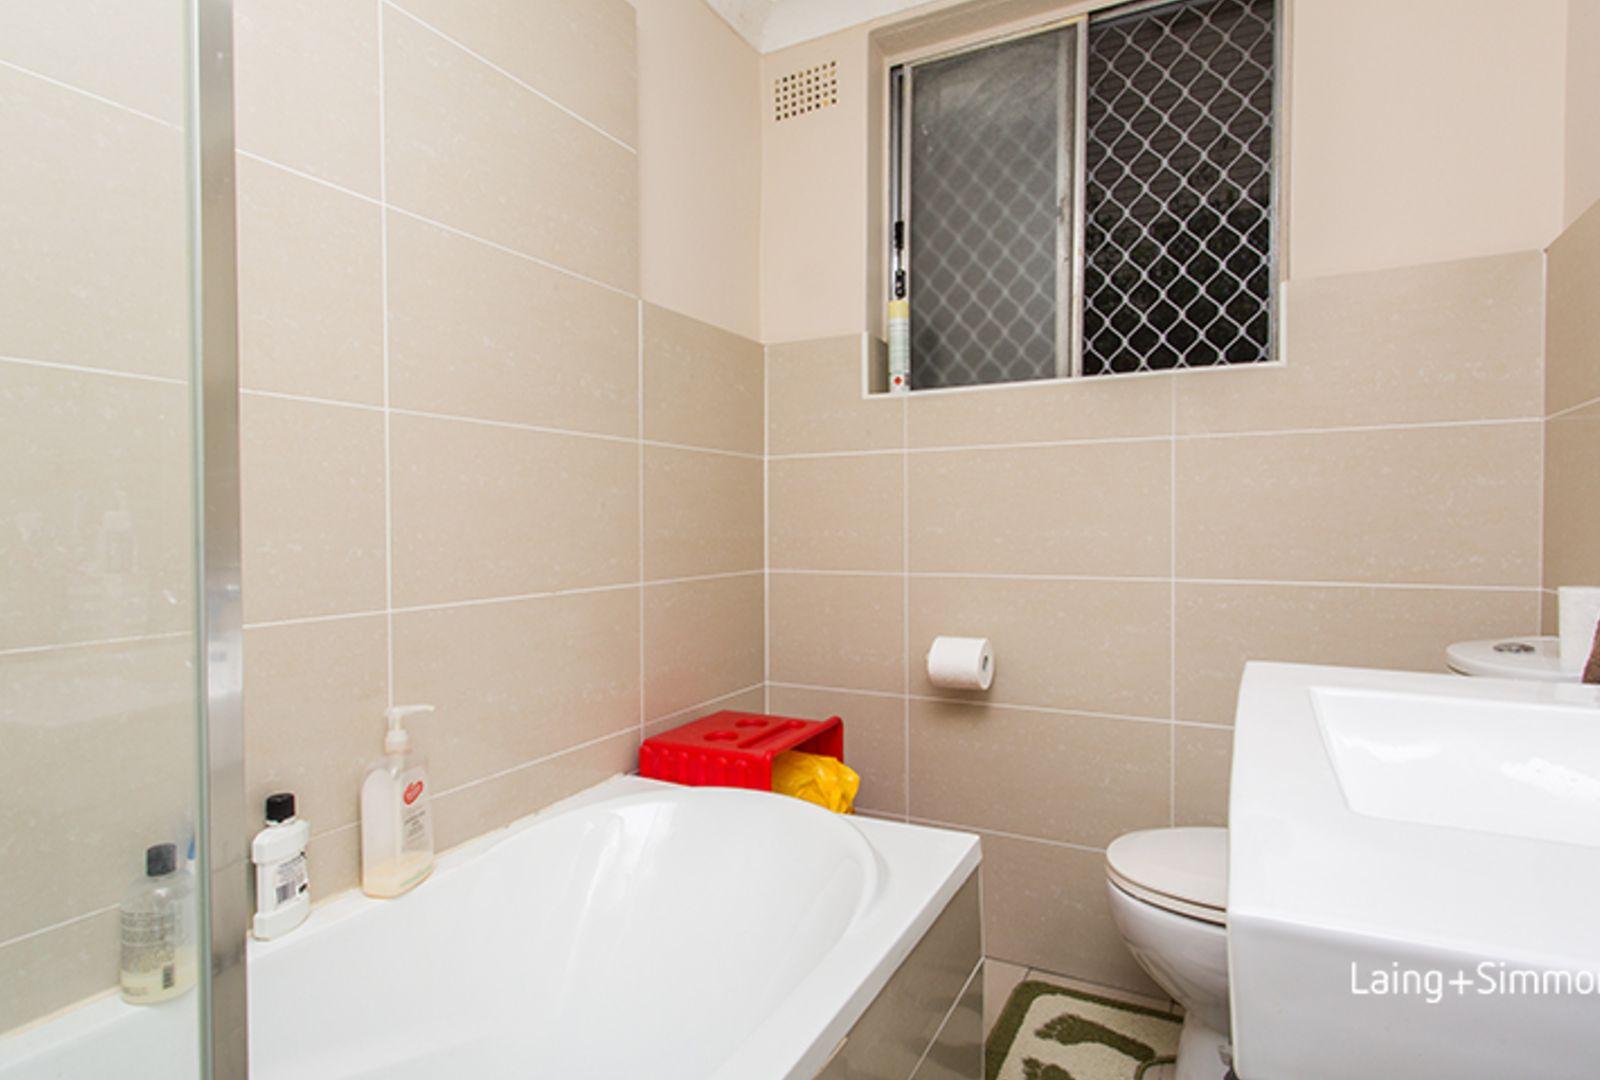 7/11-13 Crown Street, Granville NSW 2142, Image 4